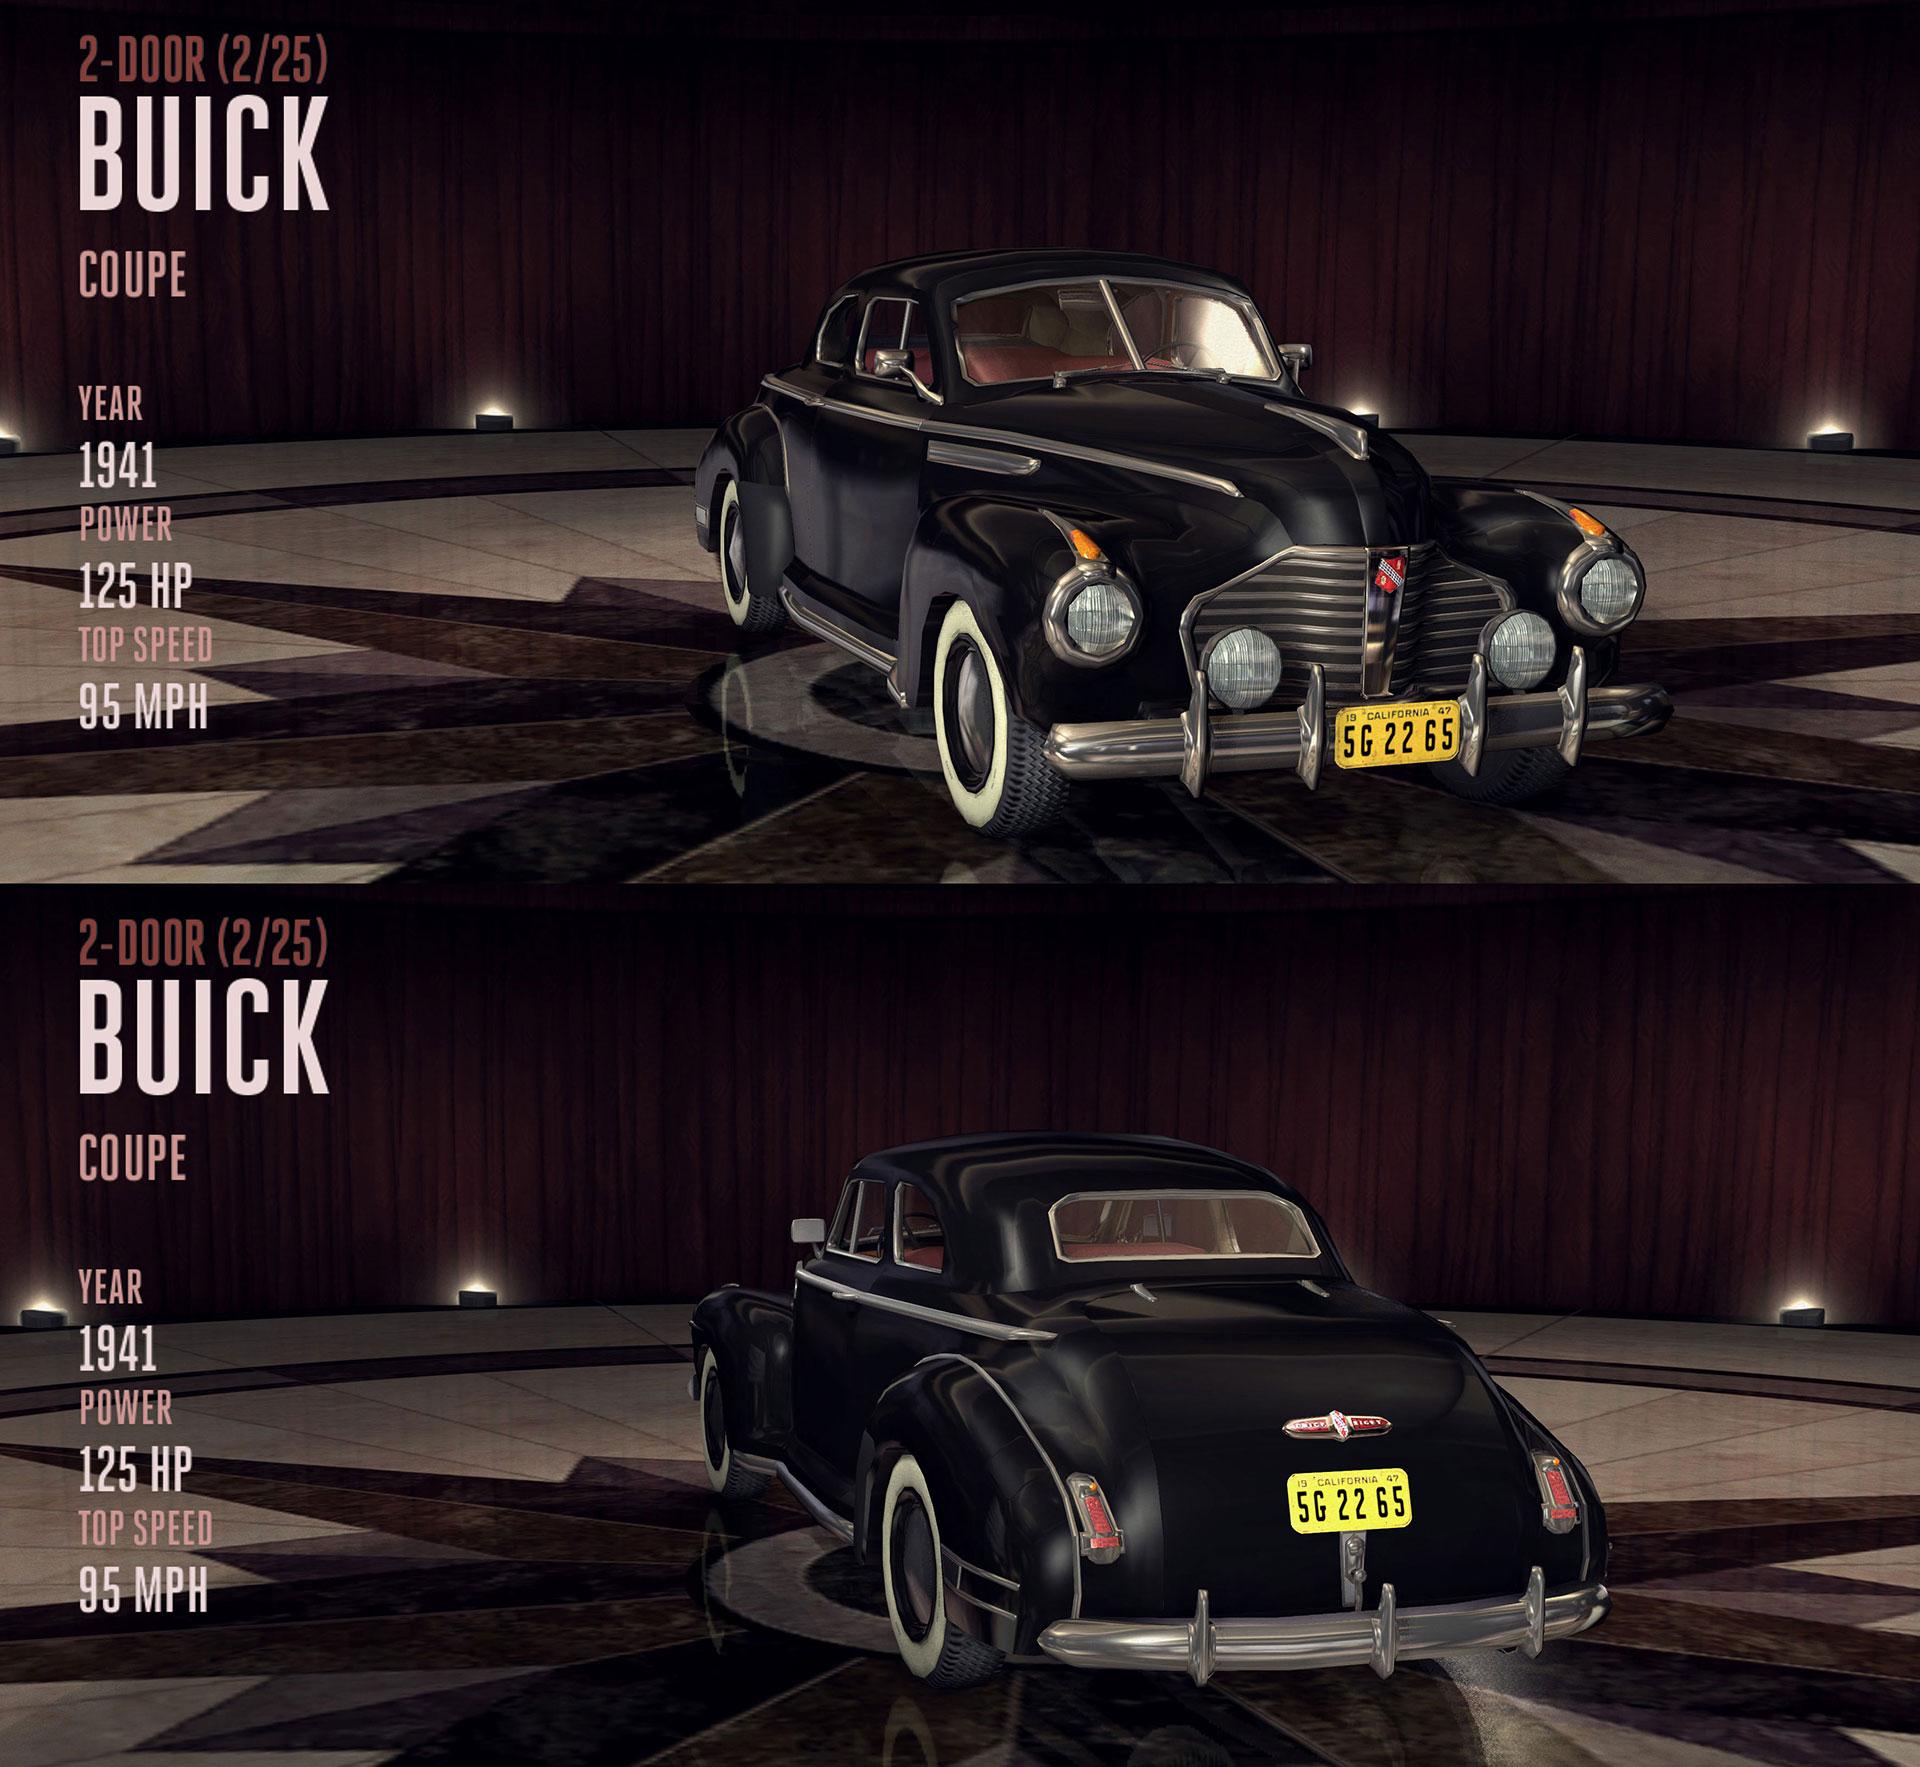 Archivo:1941-buick-coupe.jpg